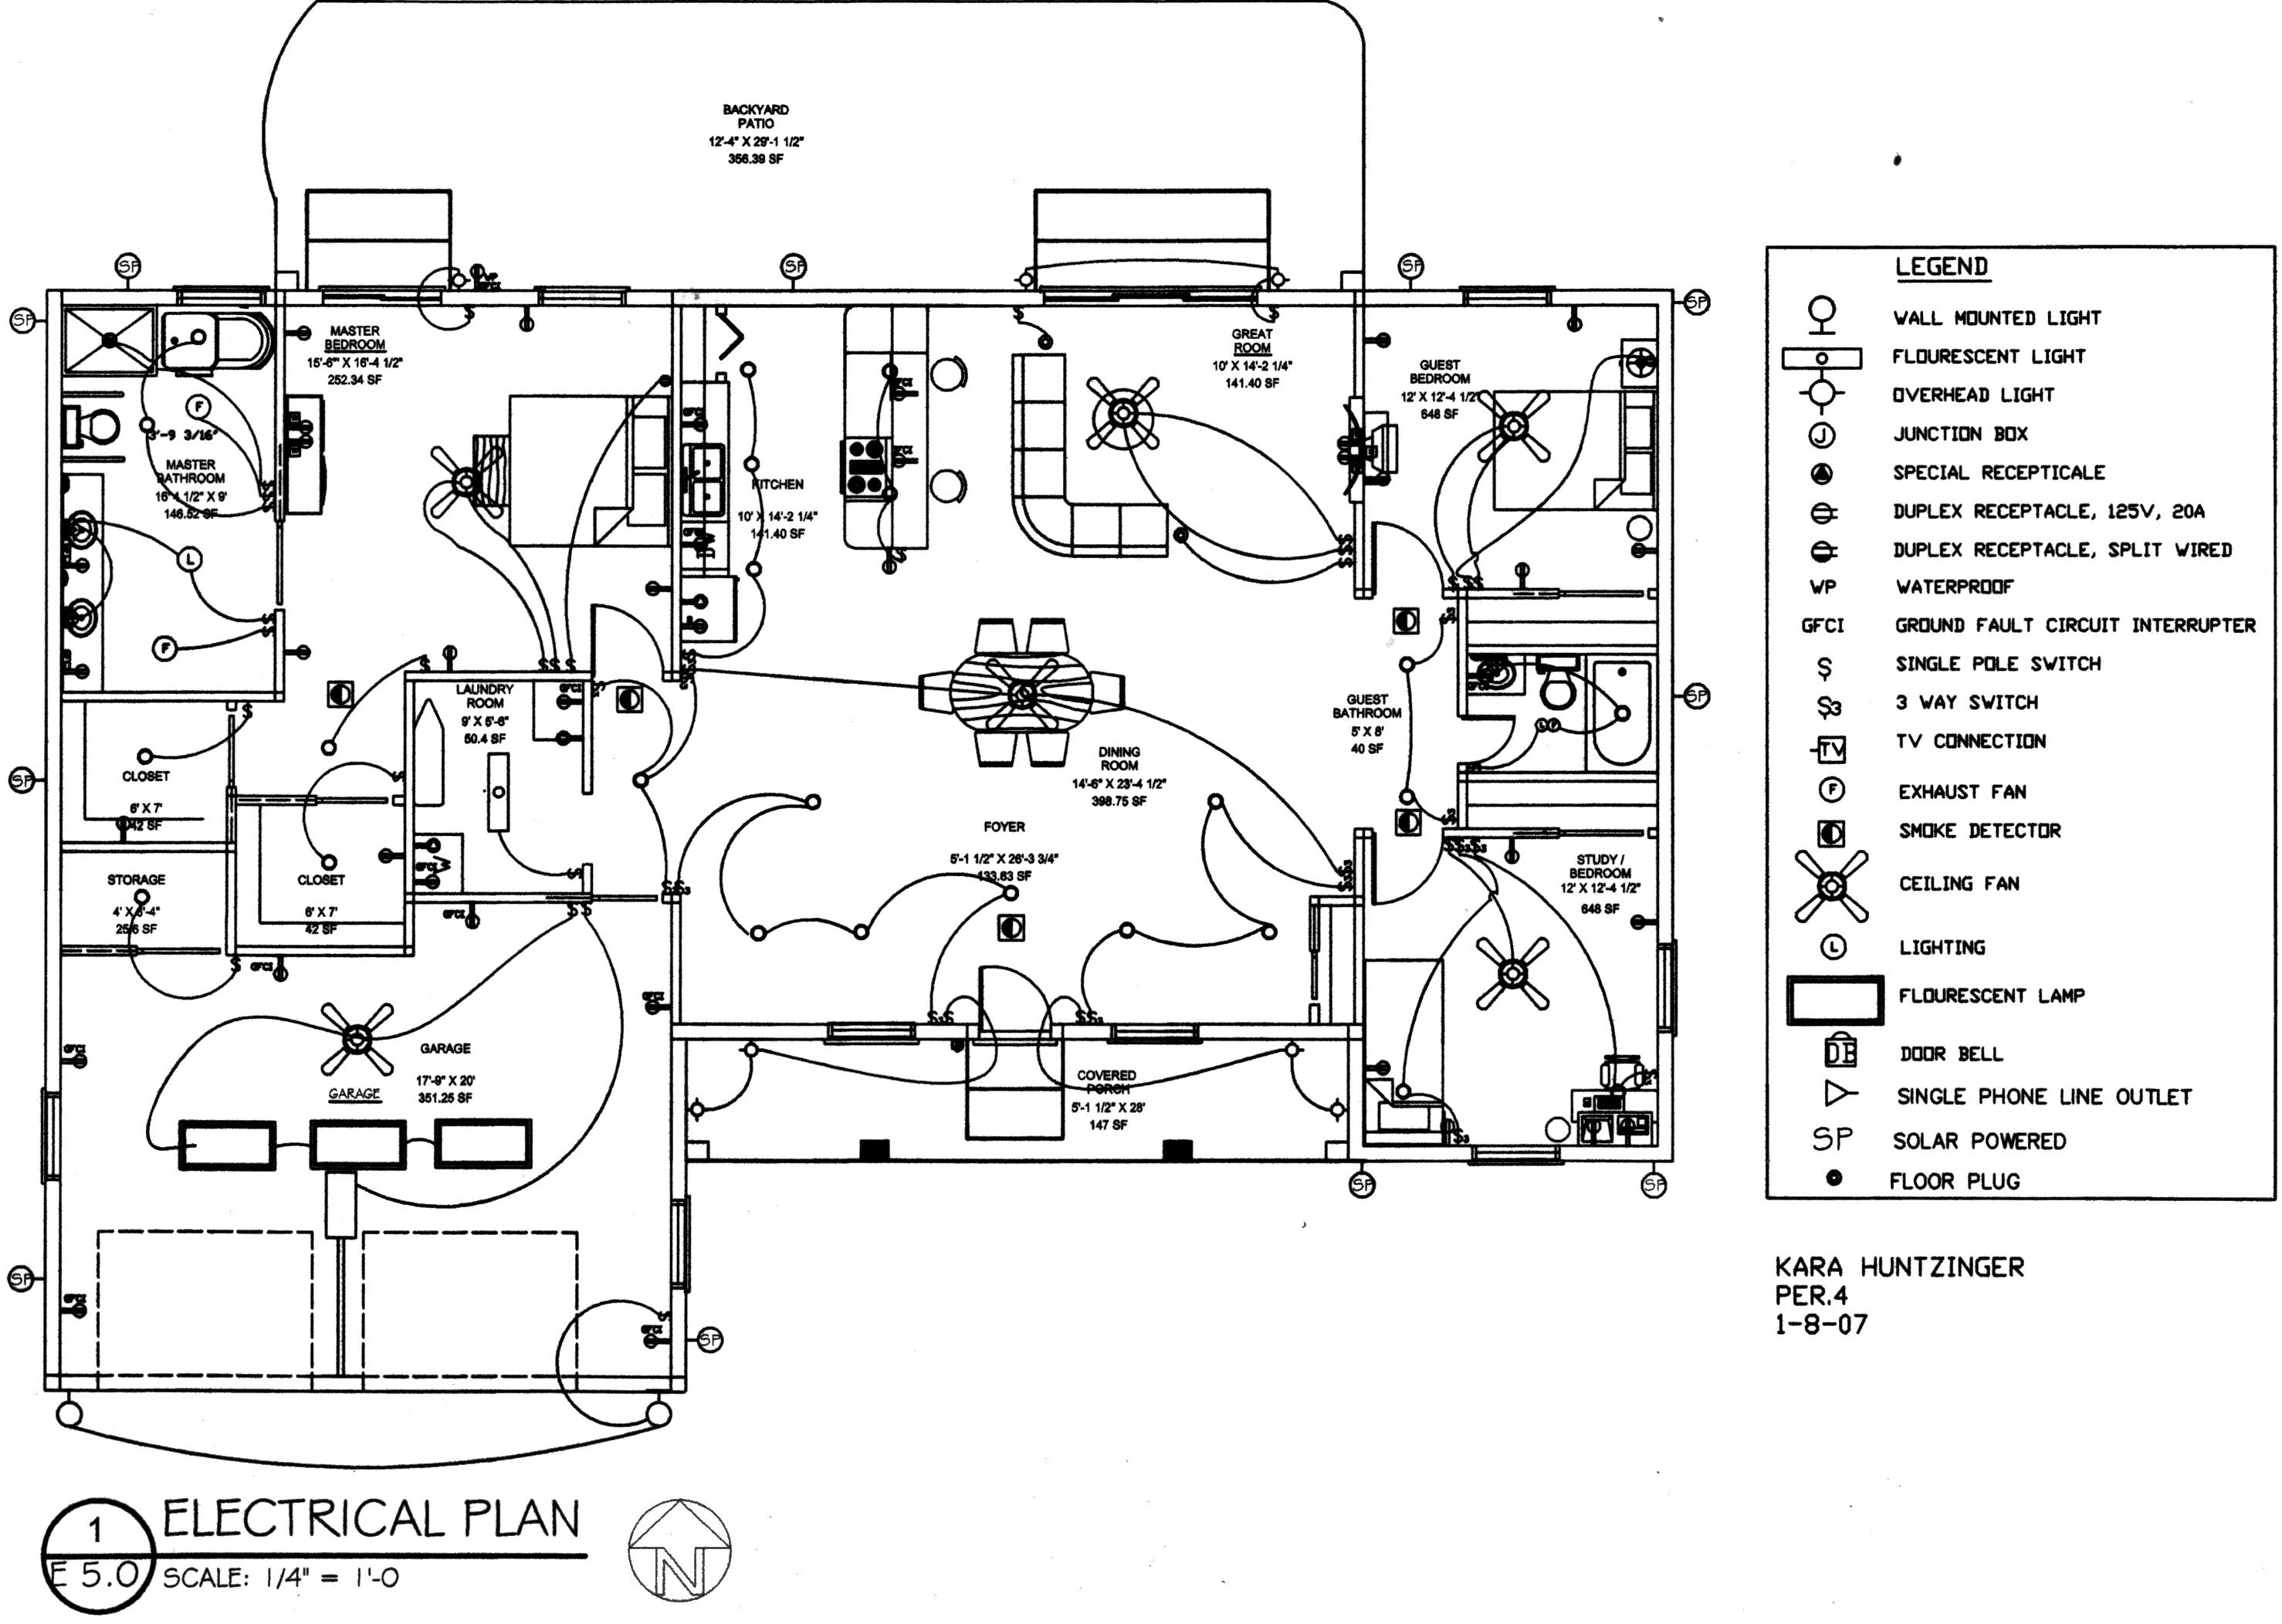 1000 images about electrical on pinterest. Black Bedroom Furniture Sets. Home Design Ideas